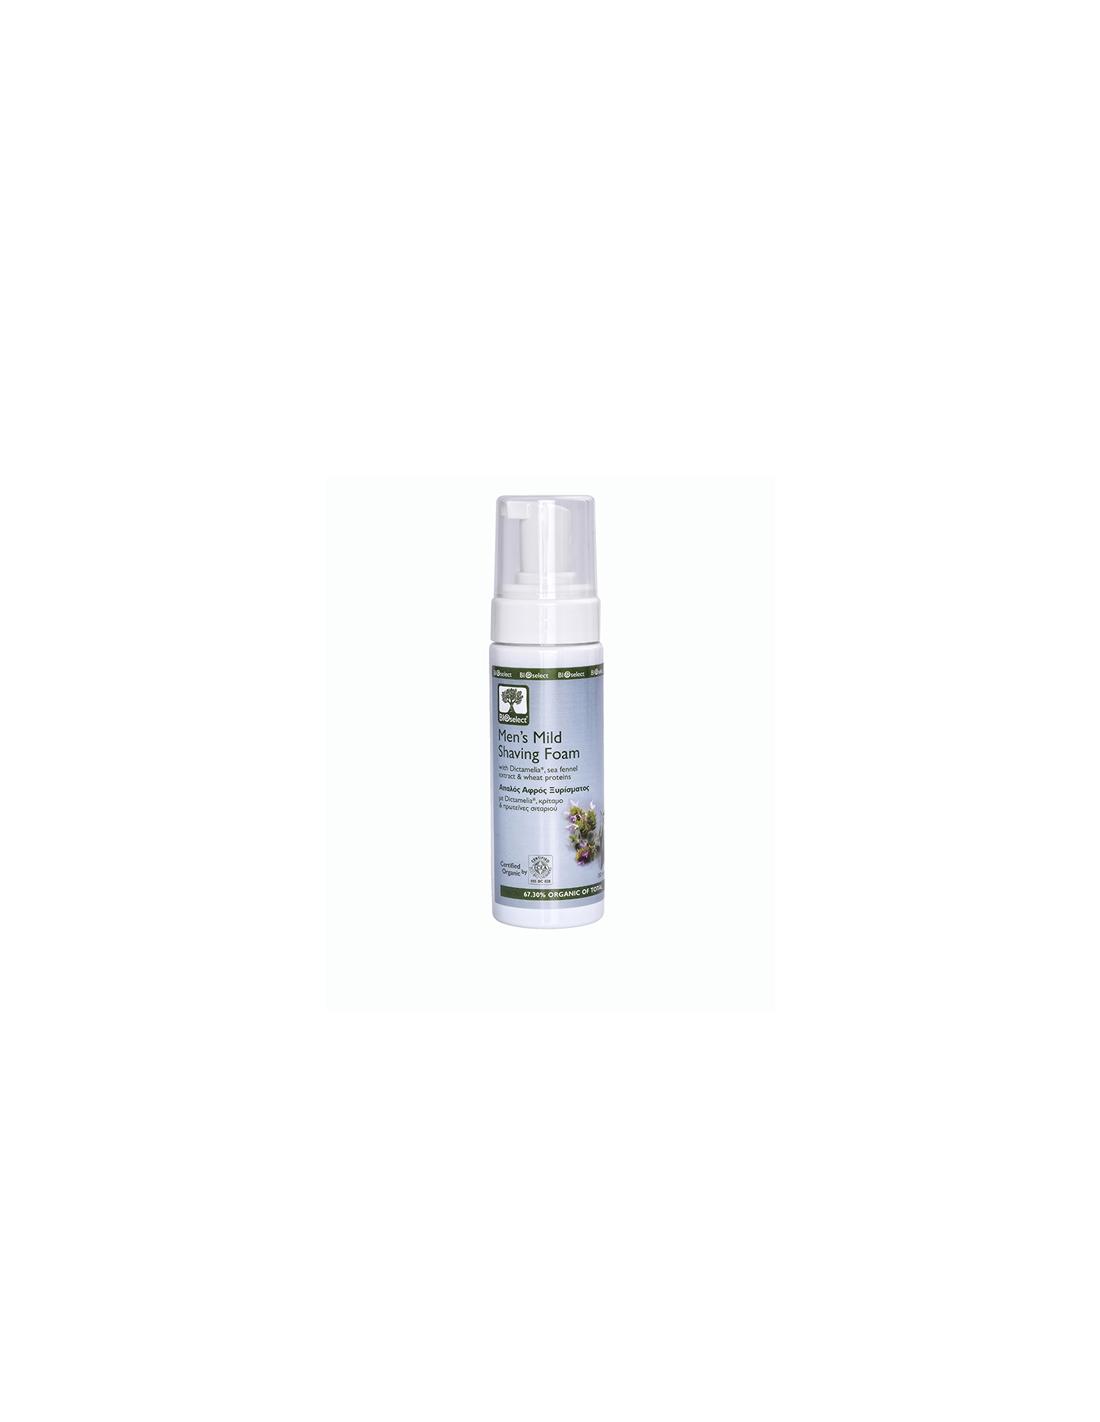 bioselect-men-s-mild-shaving-foam-150ml.jpg